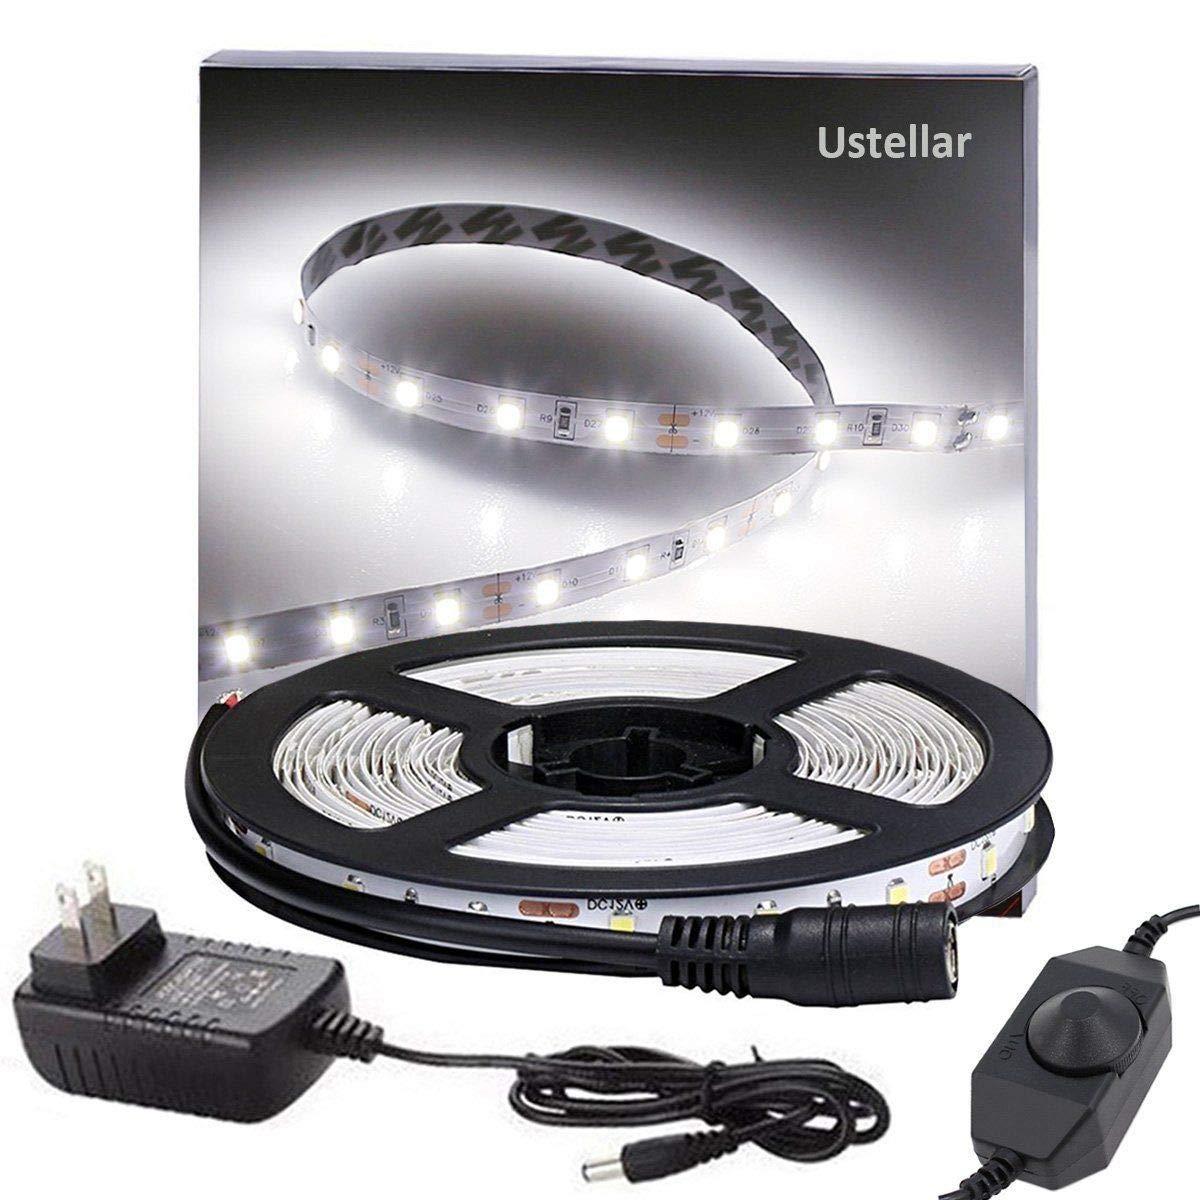 Ustellar Dimmable LED Light Strip Kit, 300 Units SMD 2835 LEDs, 16.4ft/5m 12V LED Ribbon, 6000K Daylight White Under Cabinet Lighting Strips, Non-waterproof LED Tape, UL Listed Power Supply UT33301-DW-NF-B